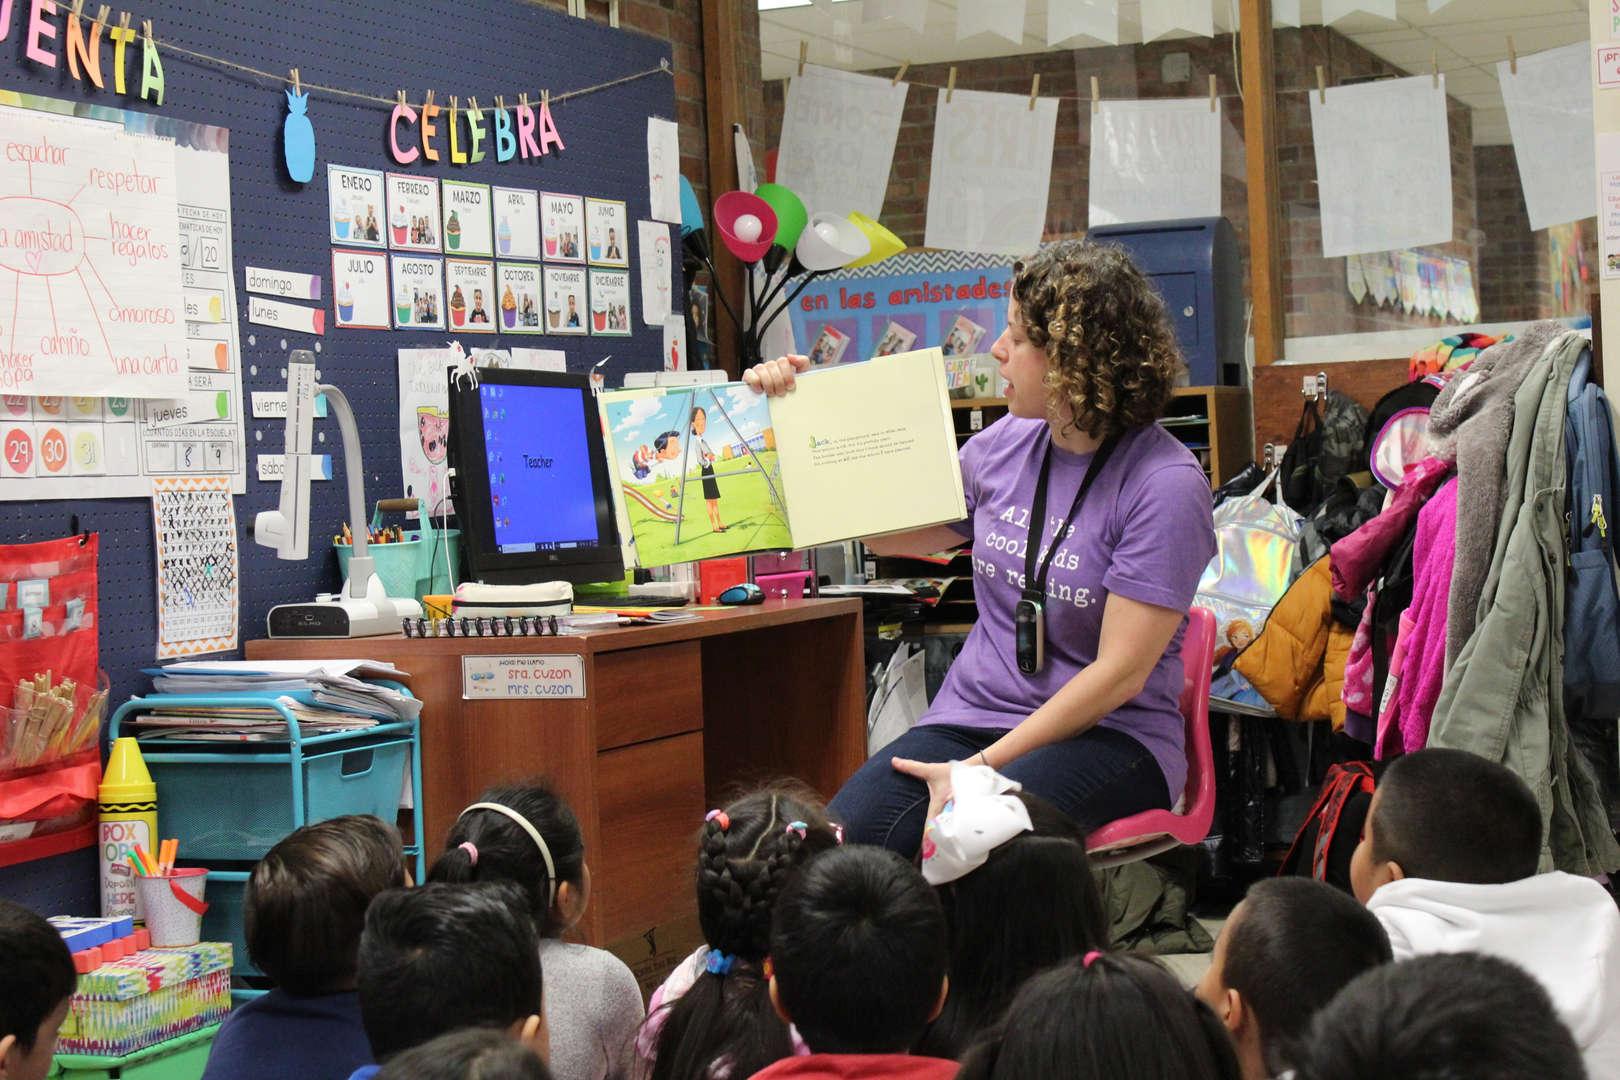 Children listen as woman reads to them